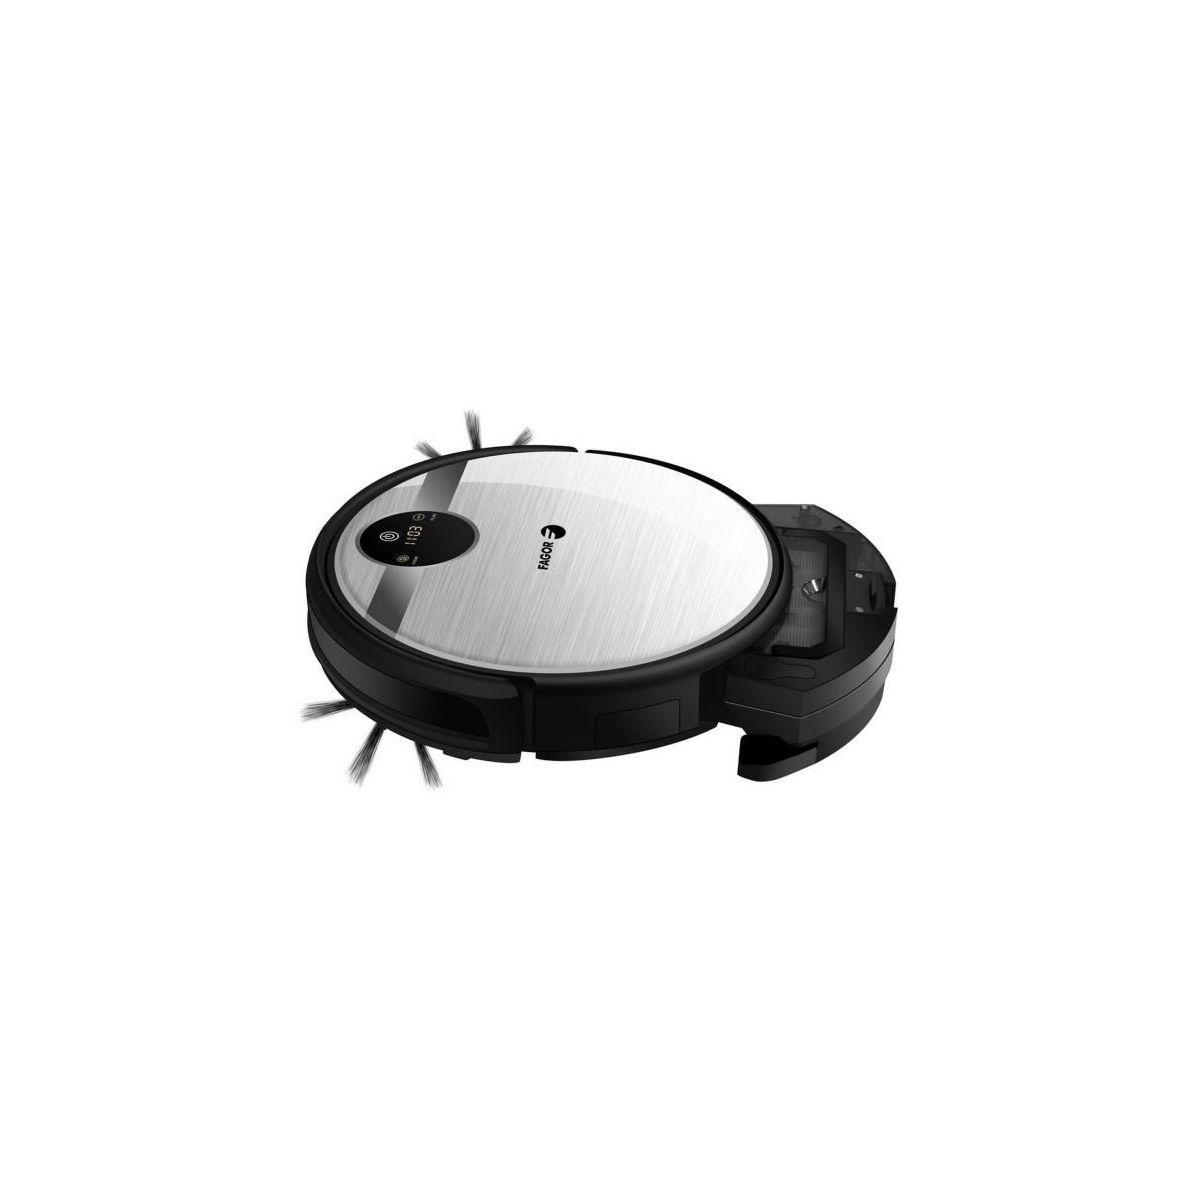 Aspirateur robot FAGOR laveur FG879